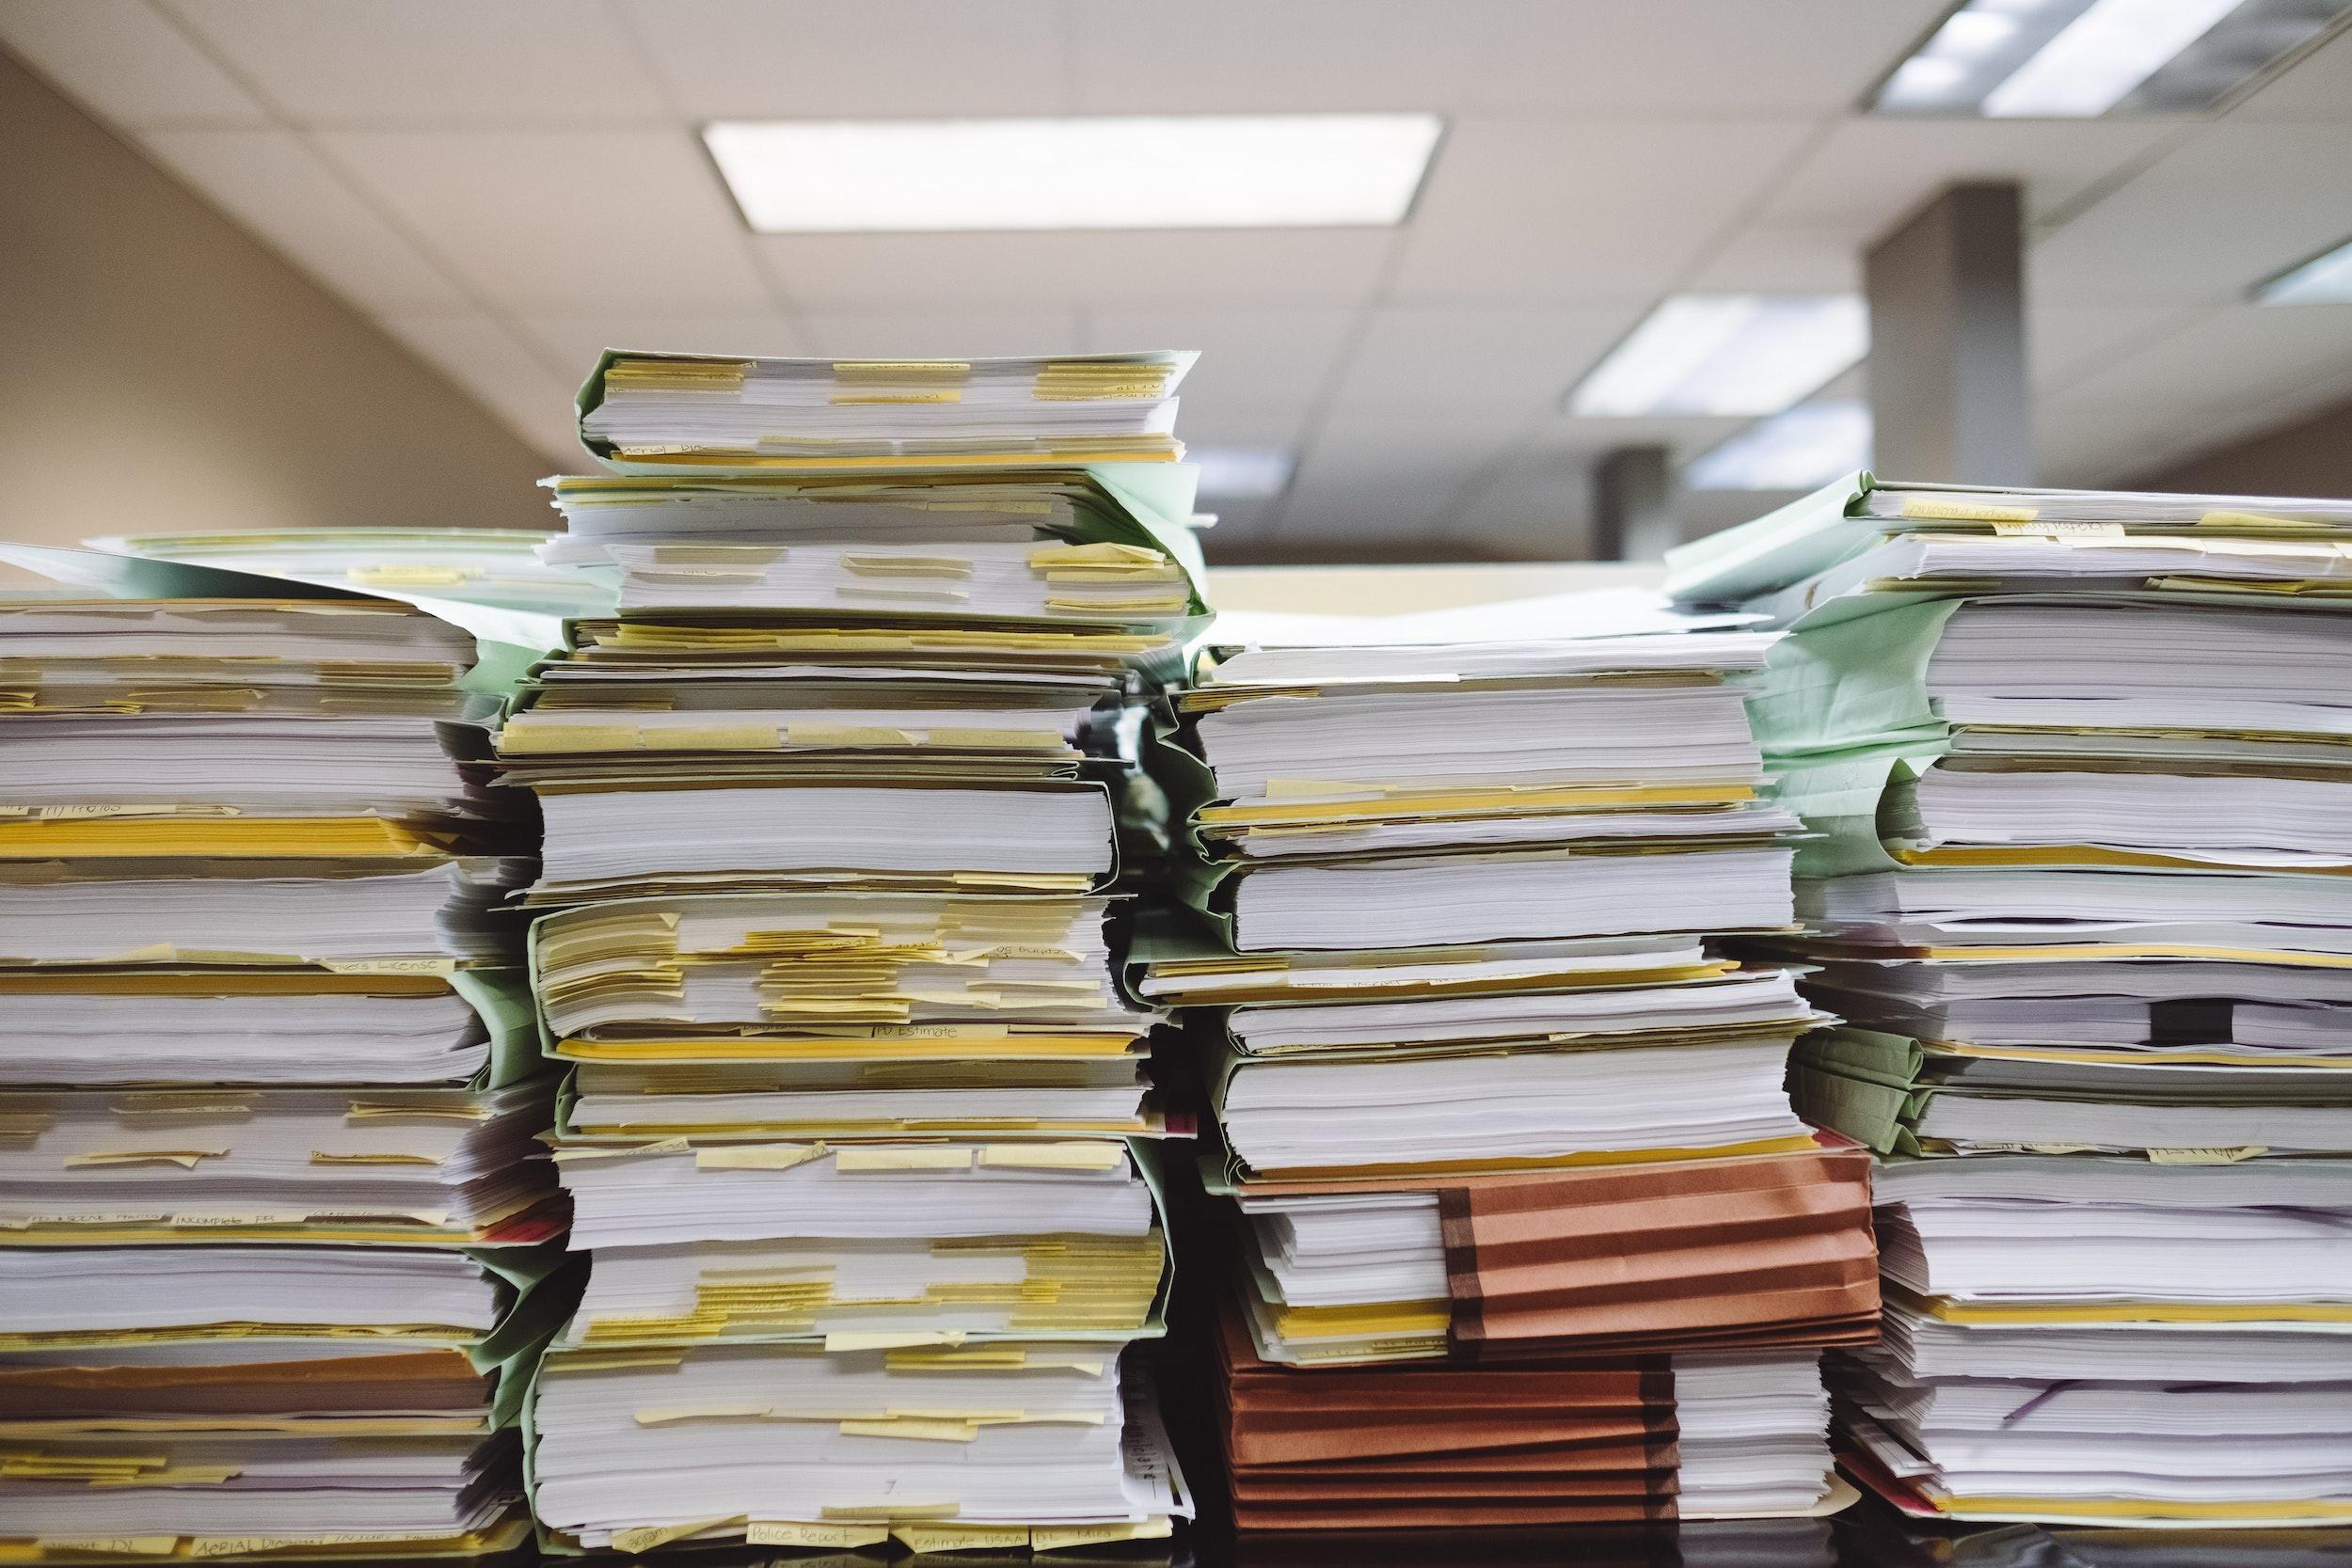 piles of regulatory paperwork FDA 510 k stacks of papers